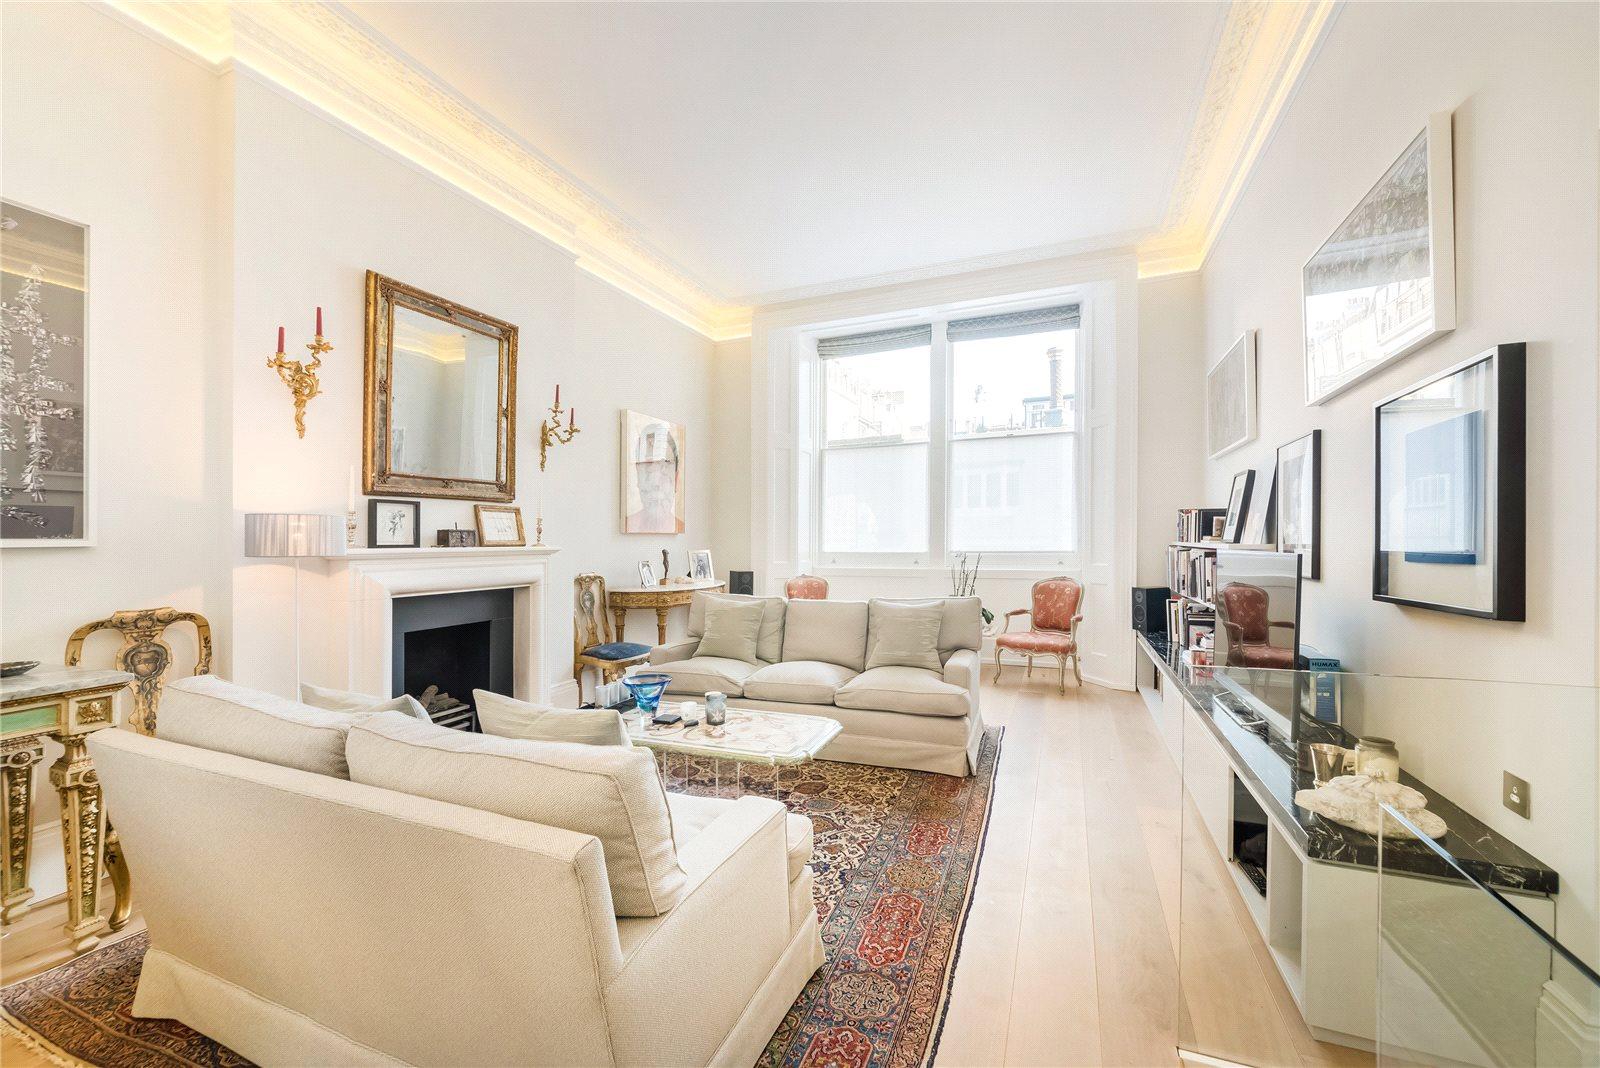 Apartments / Residences for Sale at Grenville Place, South Kensington, London, SW7 South Kensington, London, England